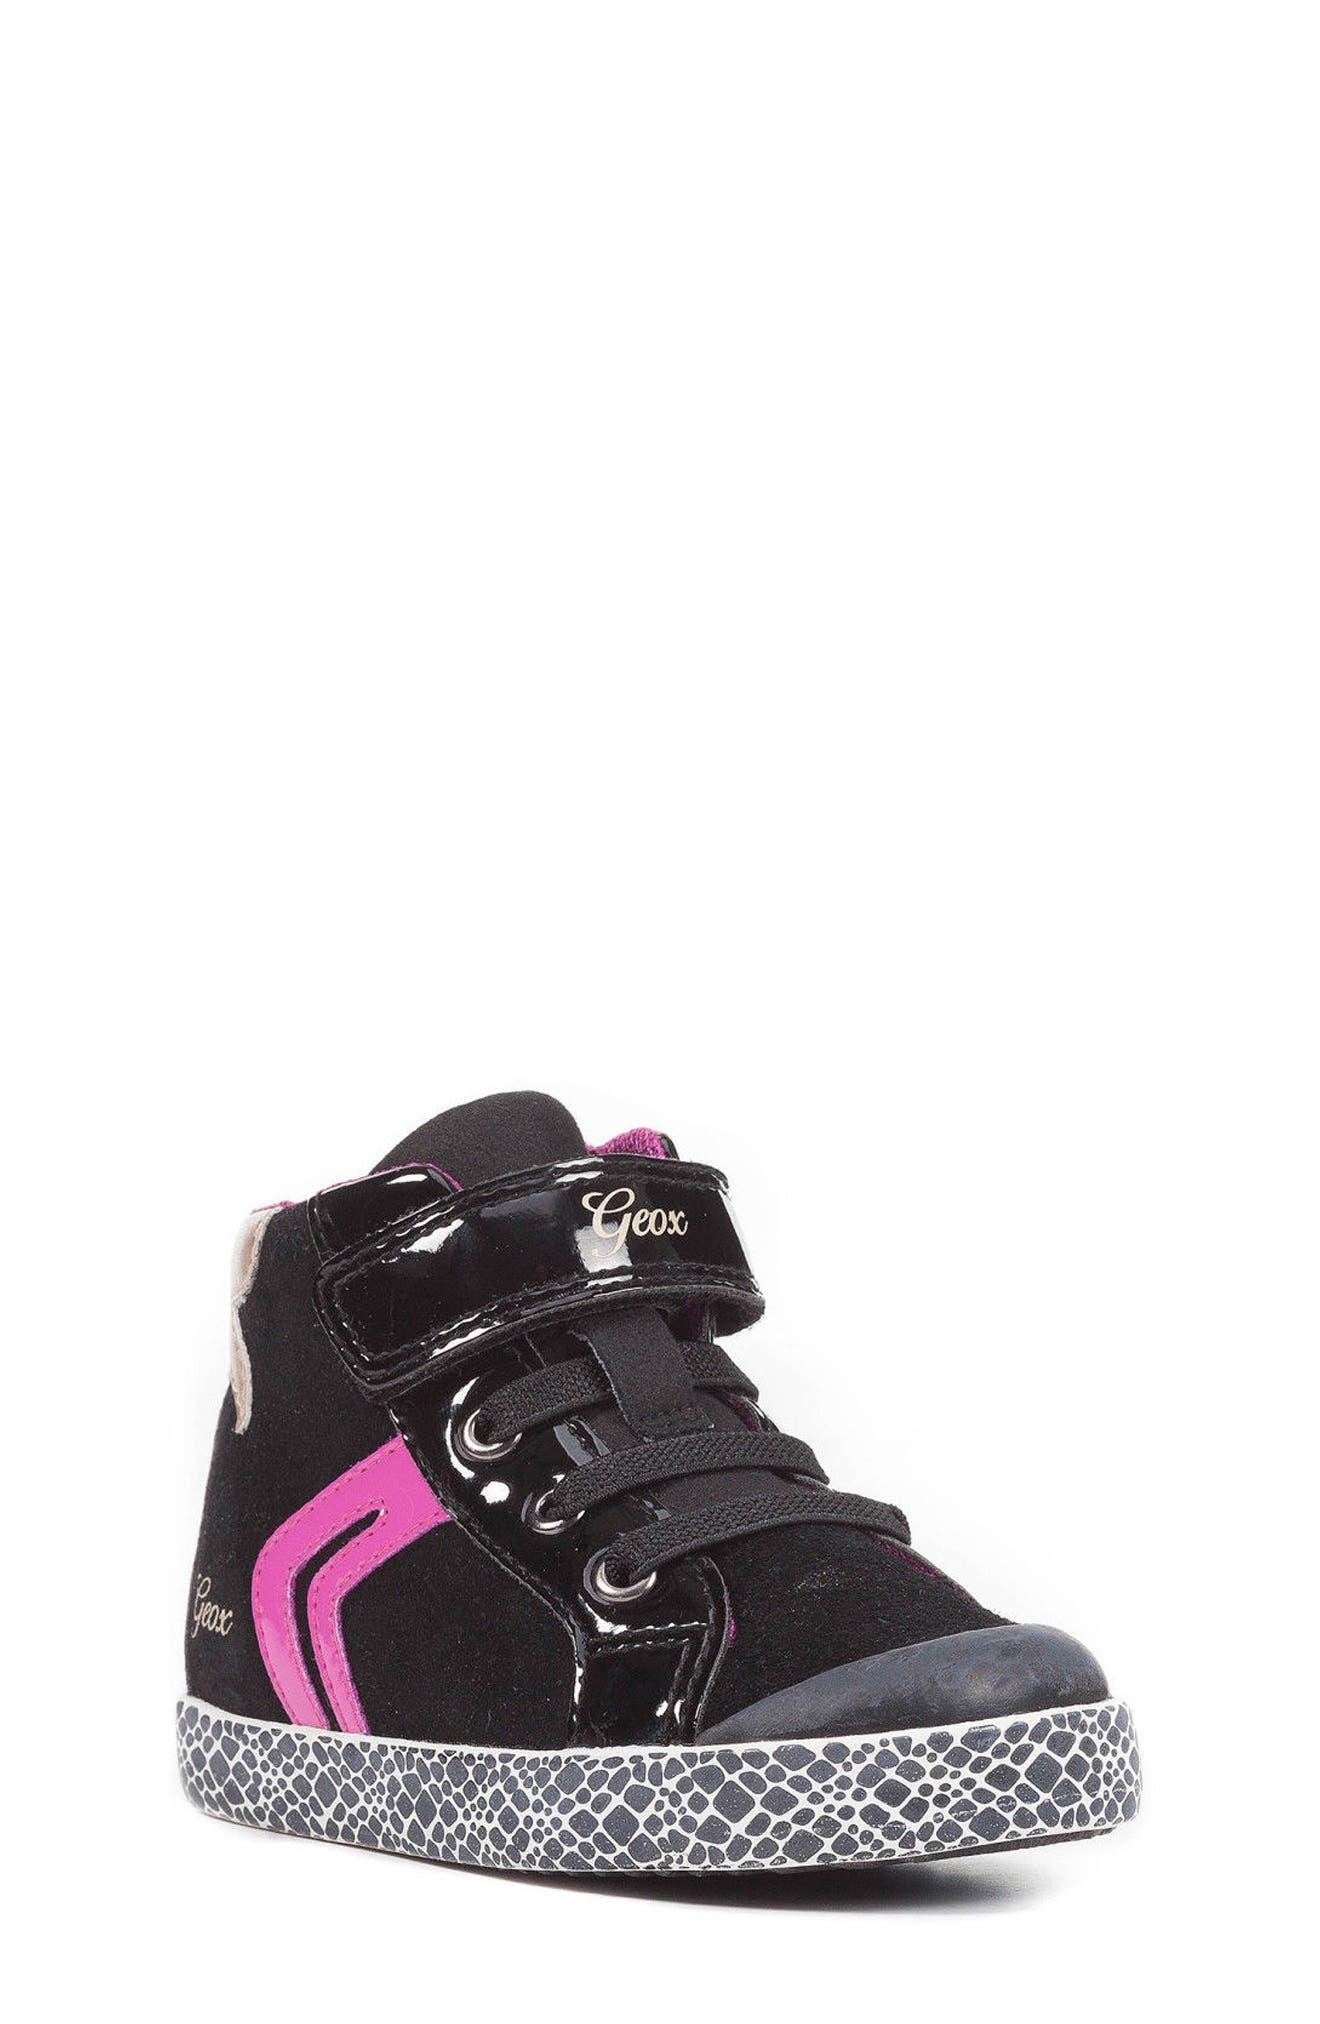 GEOX Kiwi Girl High Top Sneaker, Main, color, 001